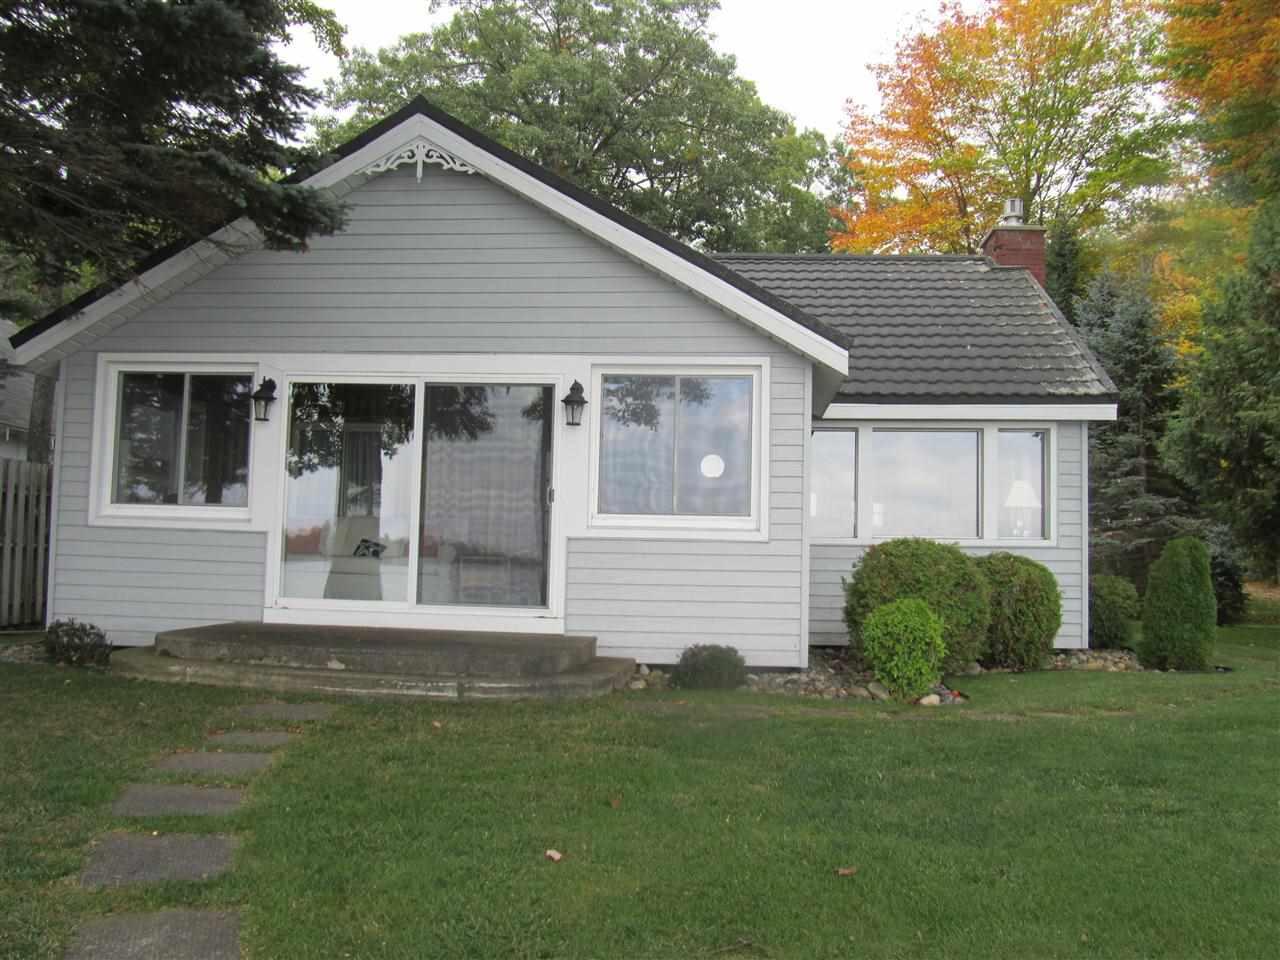 Real Estate for Sale, ListingId: 30563220, Roscommon,MI48653